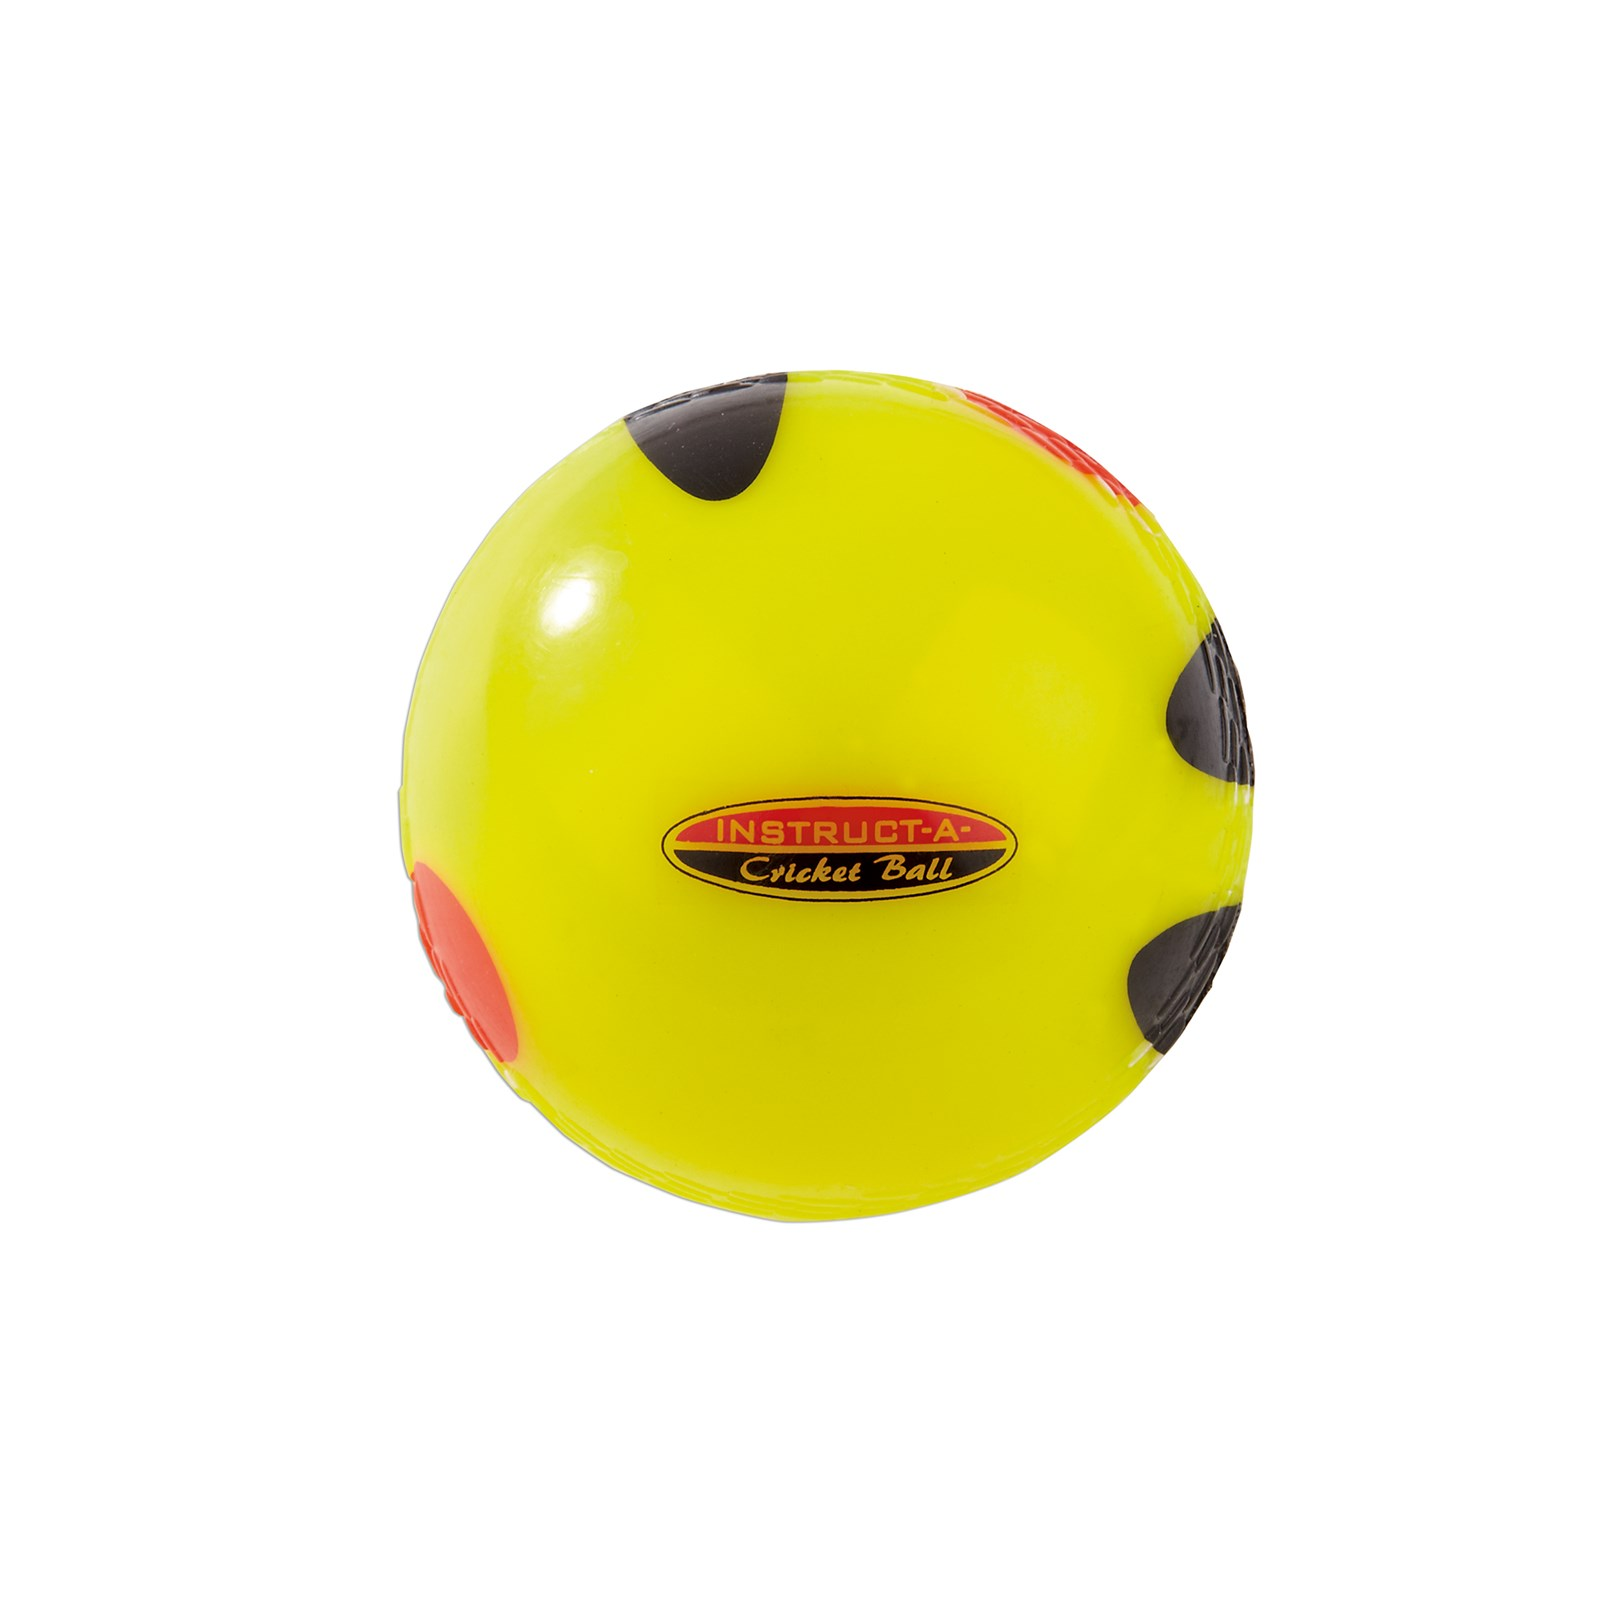 Instruct-a-Cricket Ball